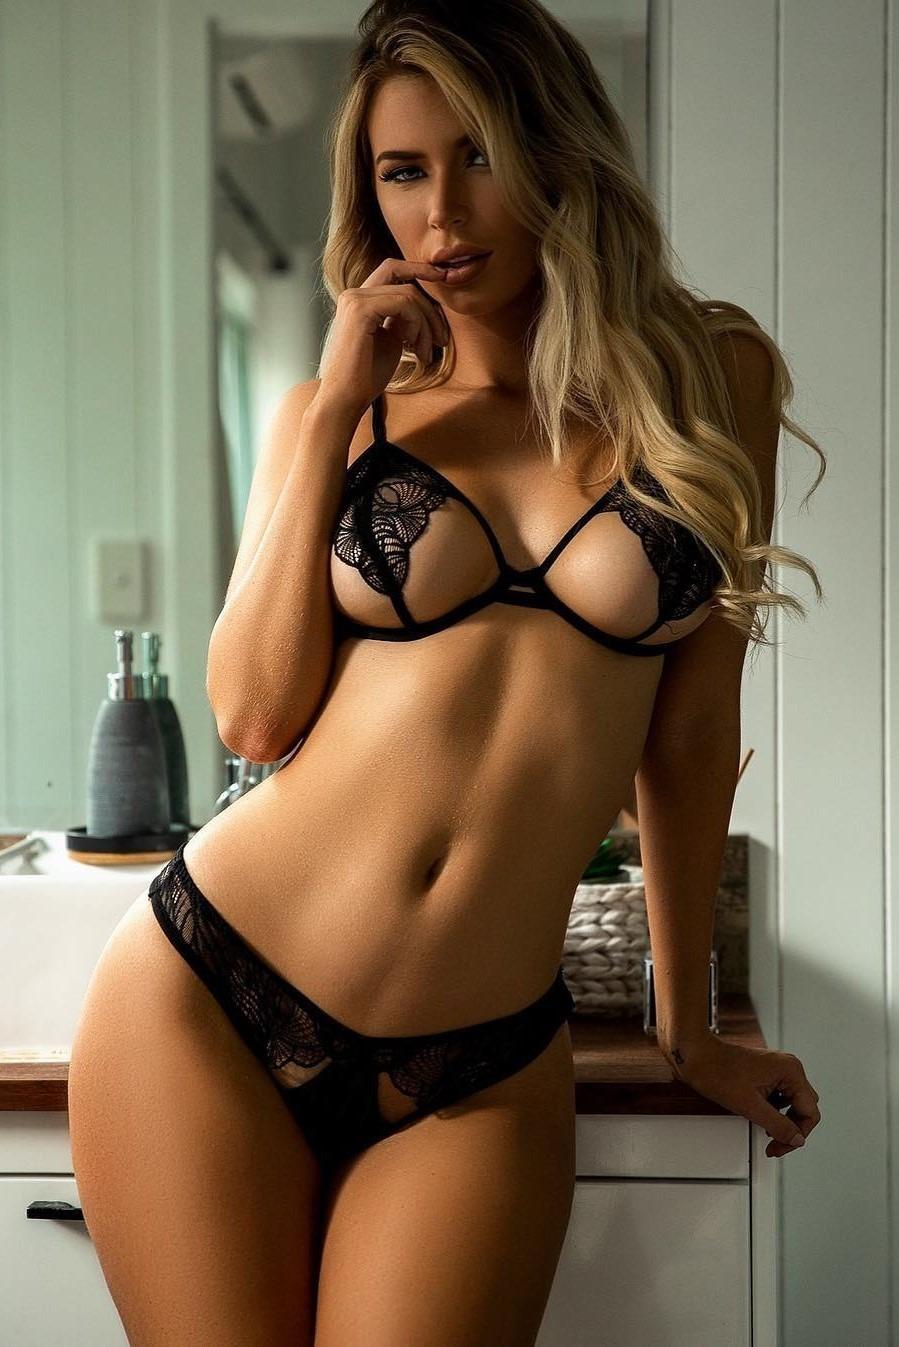 Nude Pics Of Sexy Women